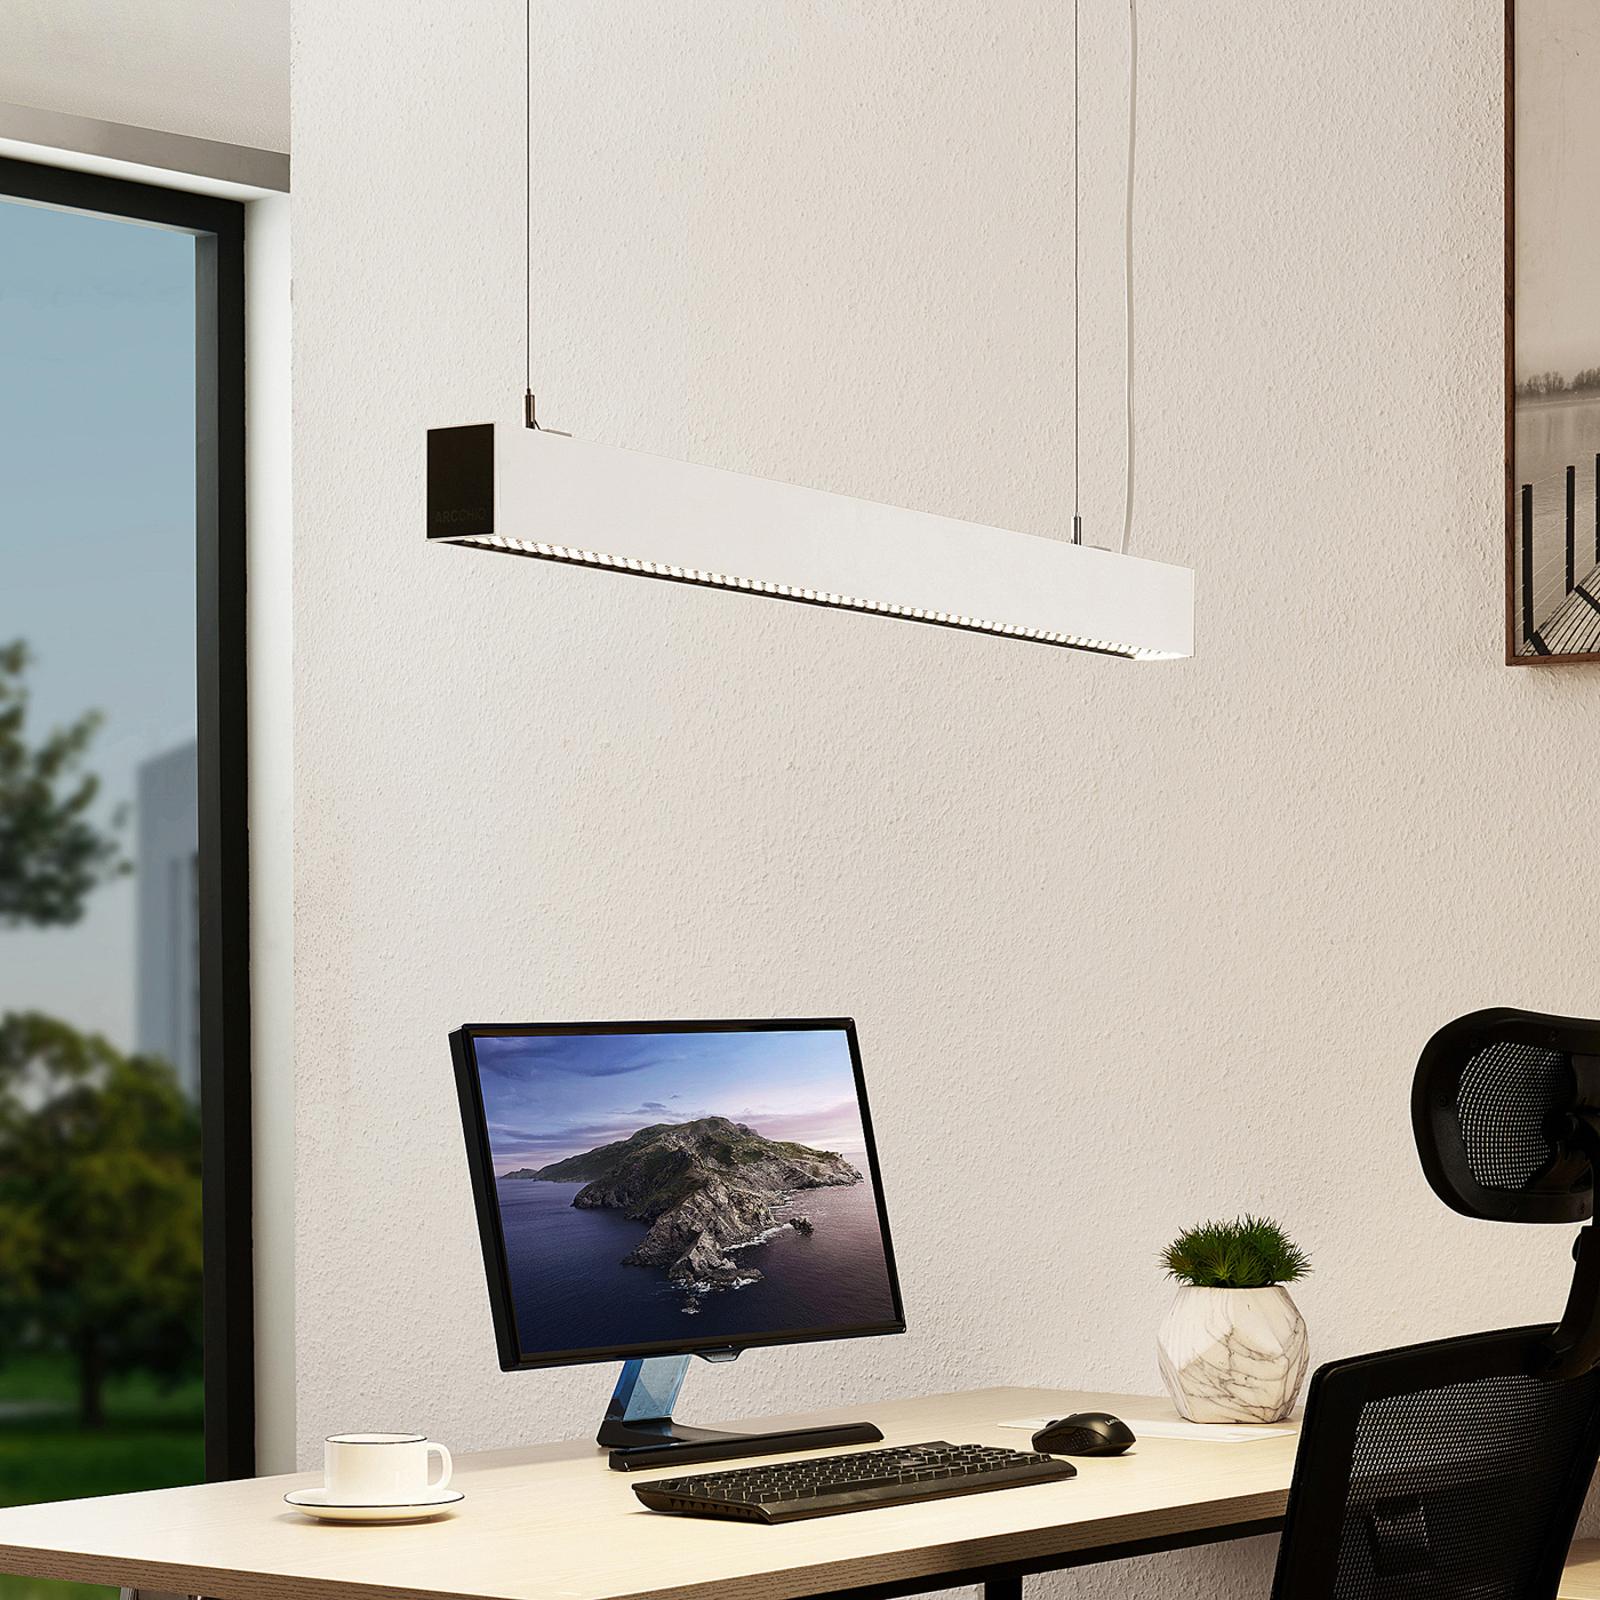 Arcchio Thores LED-Büro-Hängelampe, 113 cm weiß